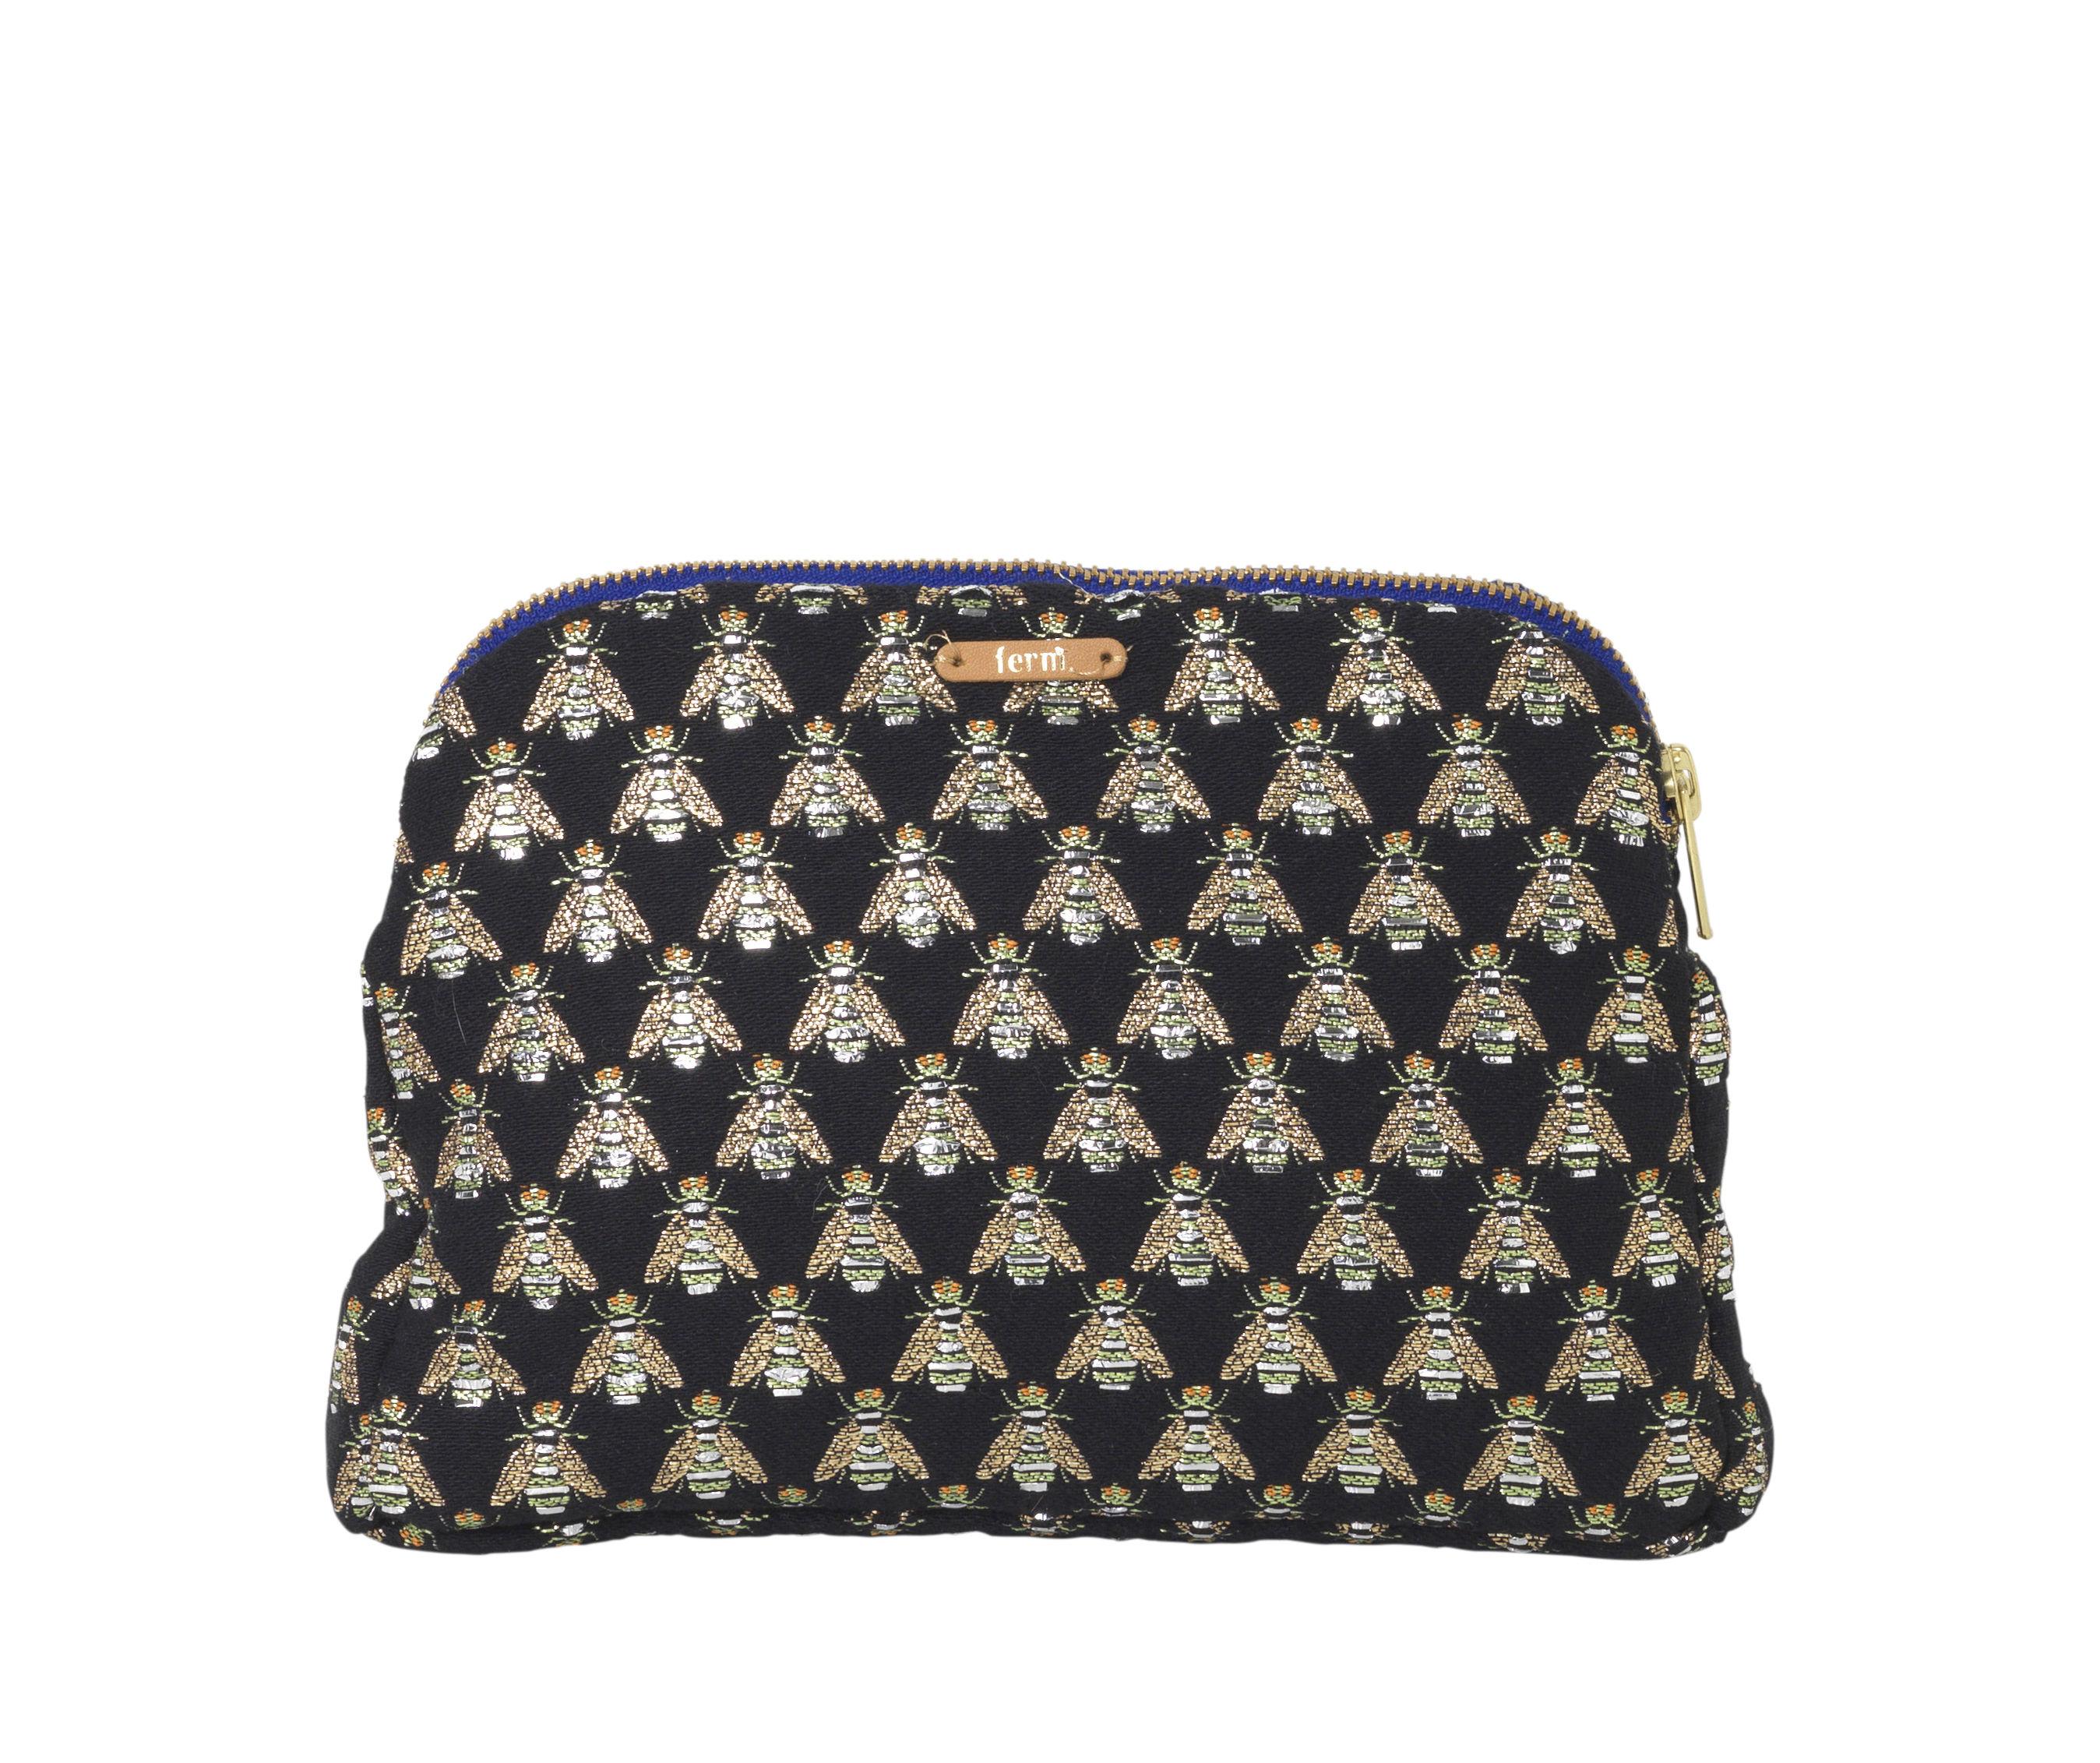 Accessories - Bags, Purses & Luggage - Salon - Mouche Case by Ferm Living - Black & gold - Brass, Mixed-fibre